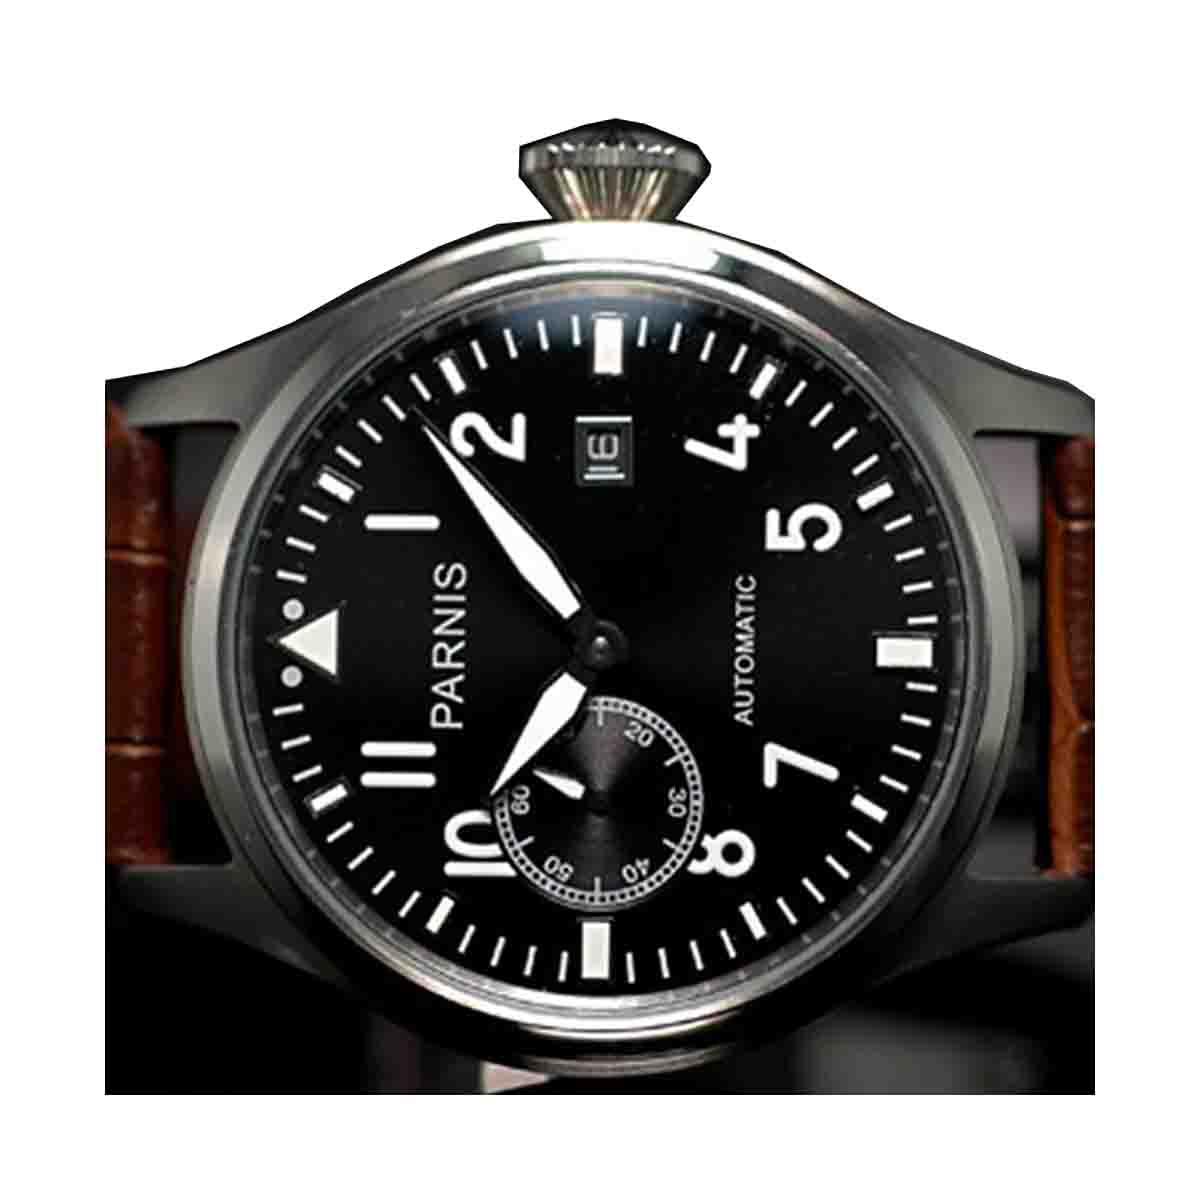 PARNIS パーニス 自動巻き 腕時計 メンズ [PN-093S3AL] 並行輸入品 当店保証24ヵ月